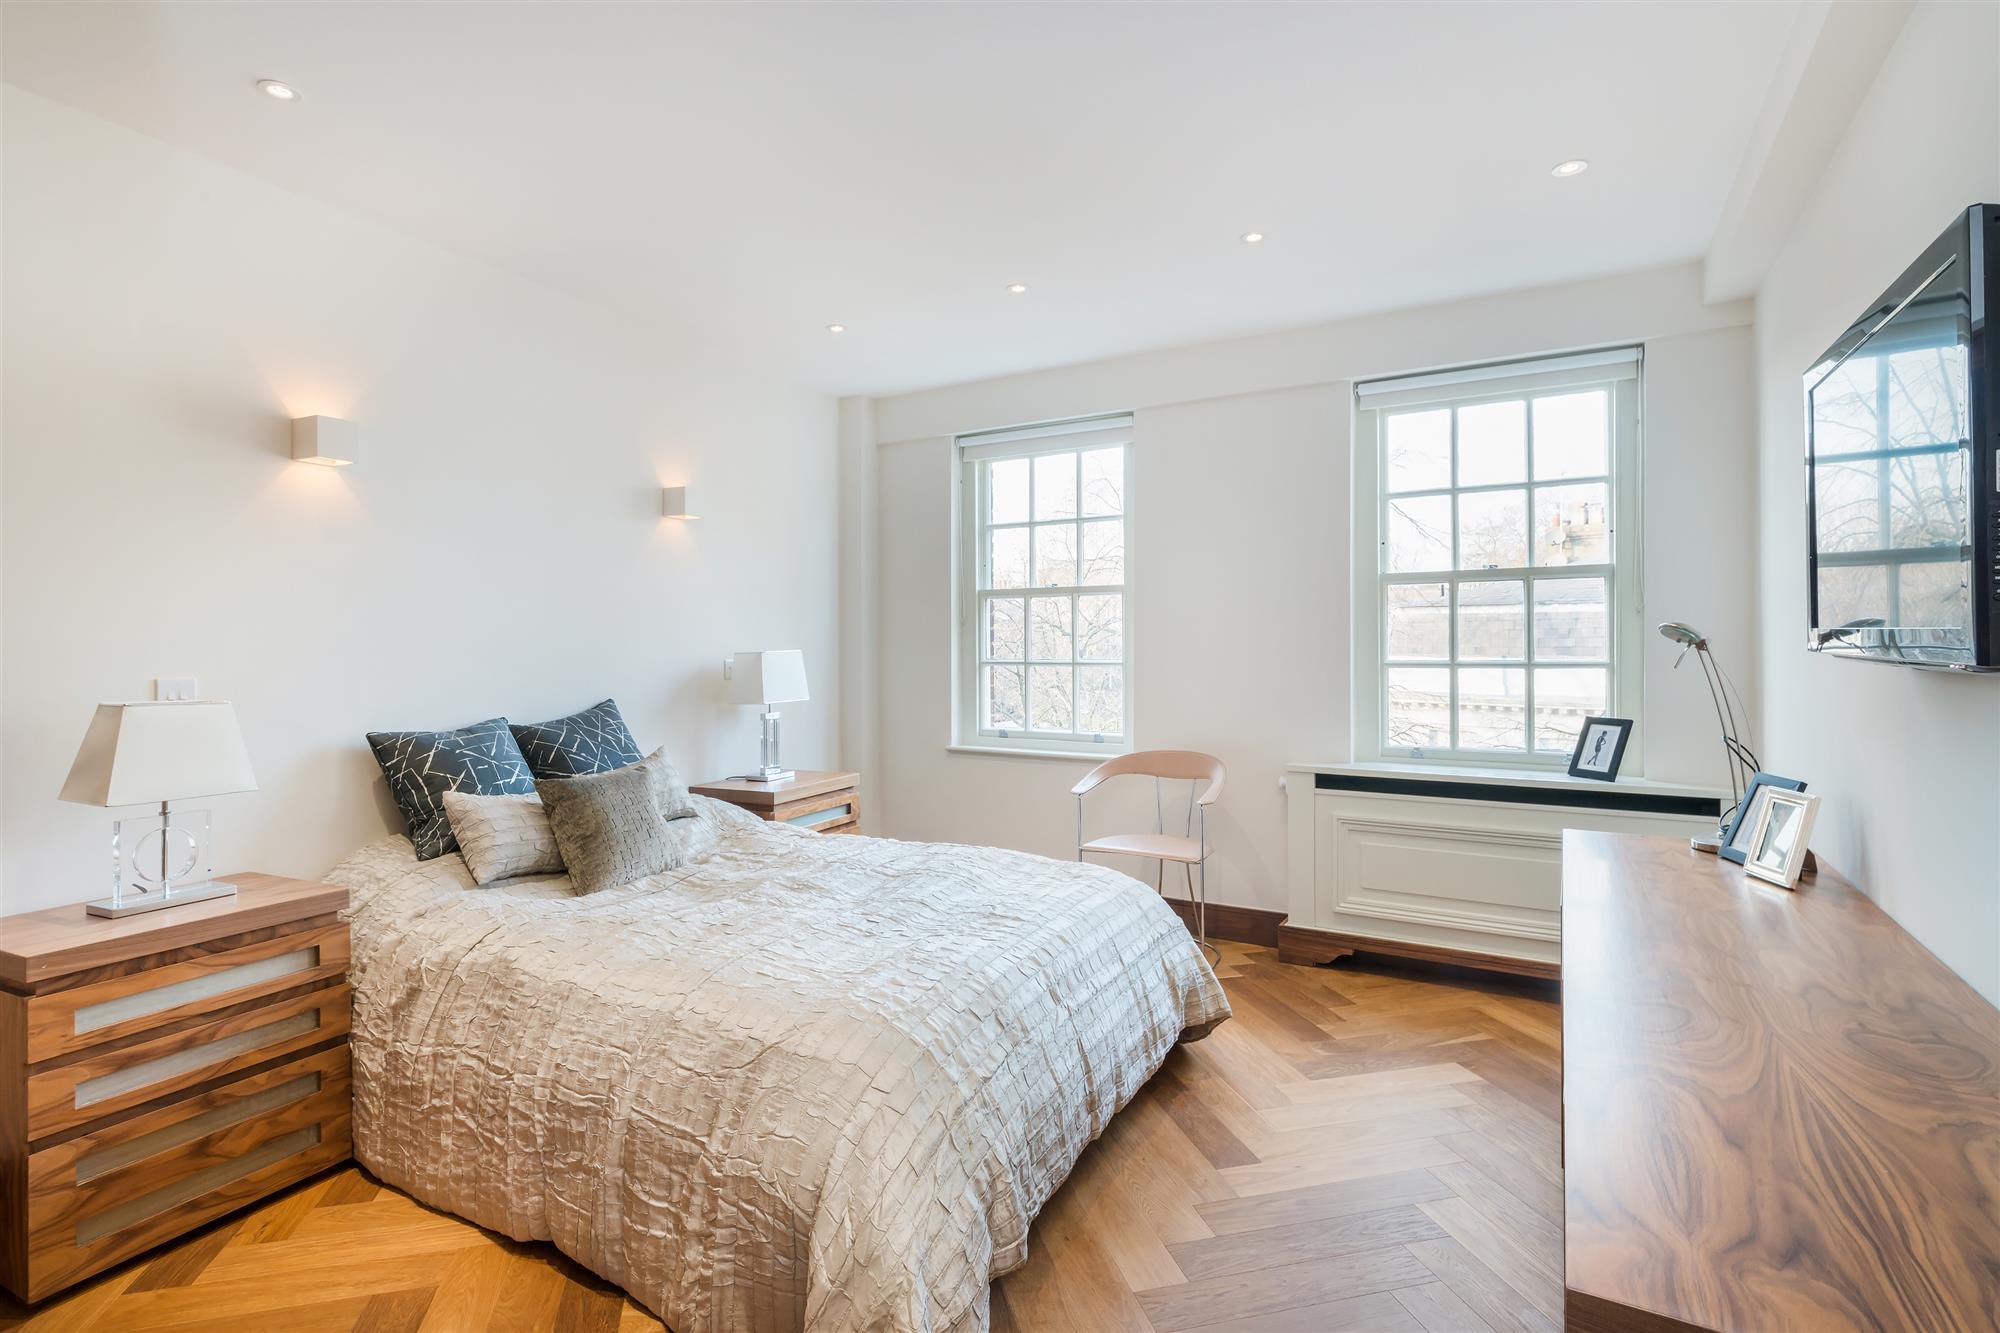 properties for sale 2 bedroom Apartment FULHAM ROAD ...